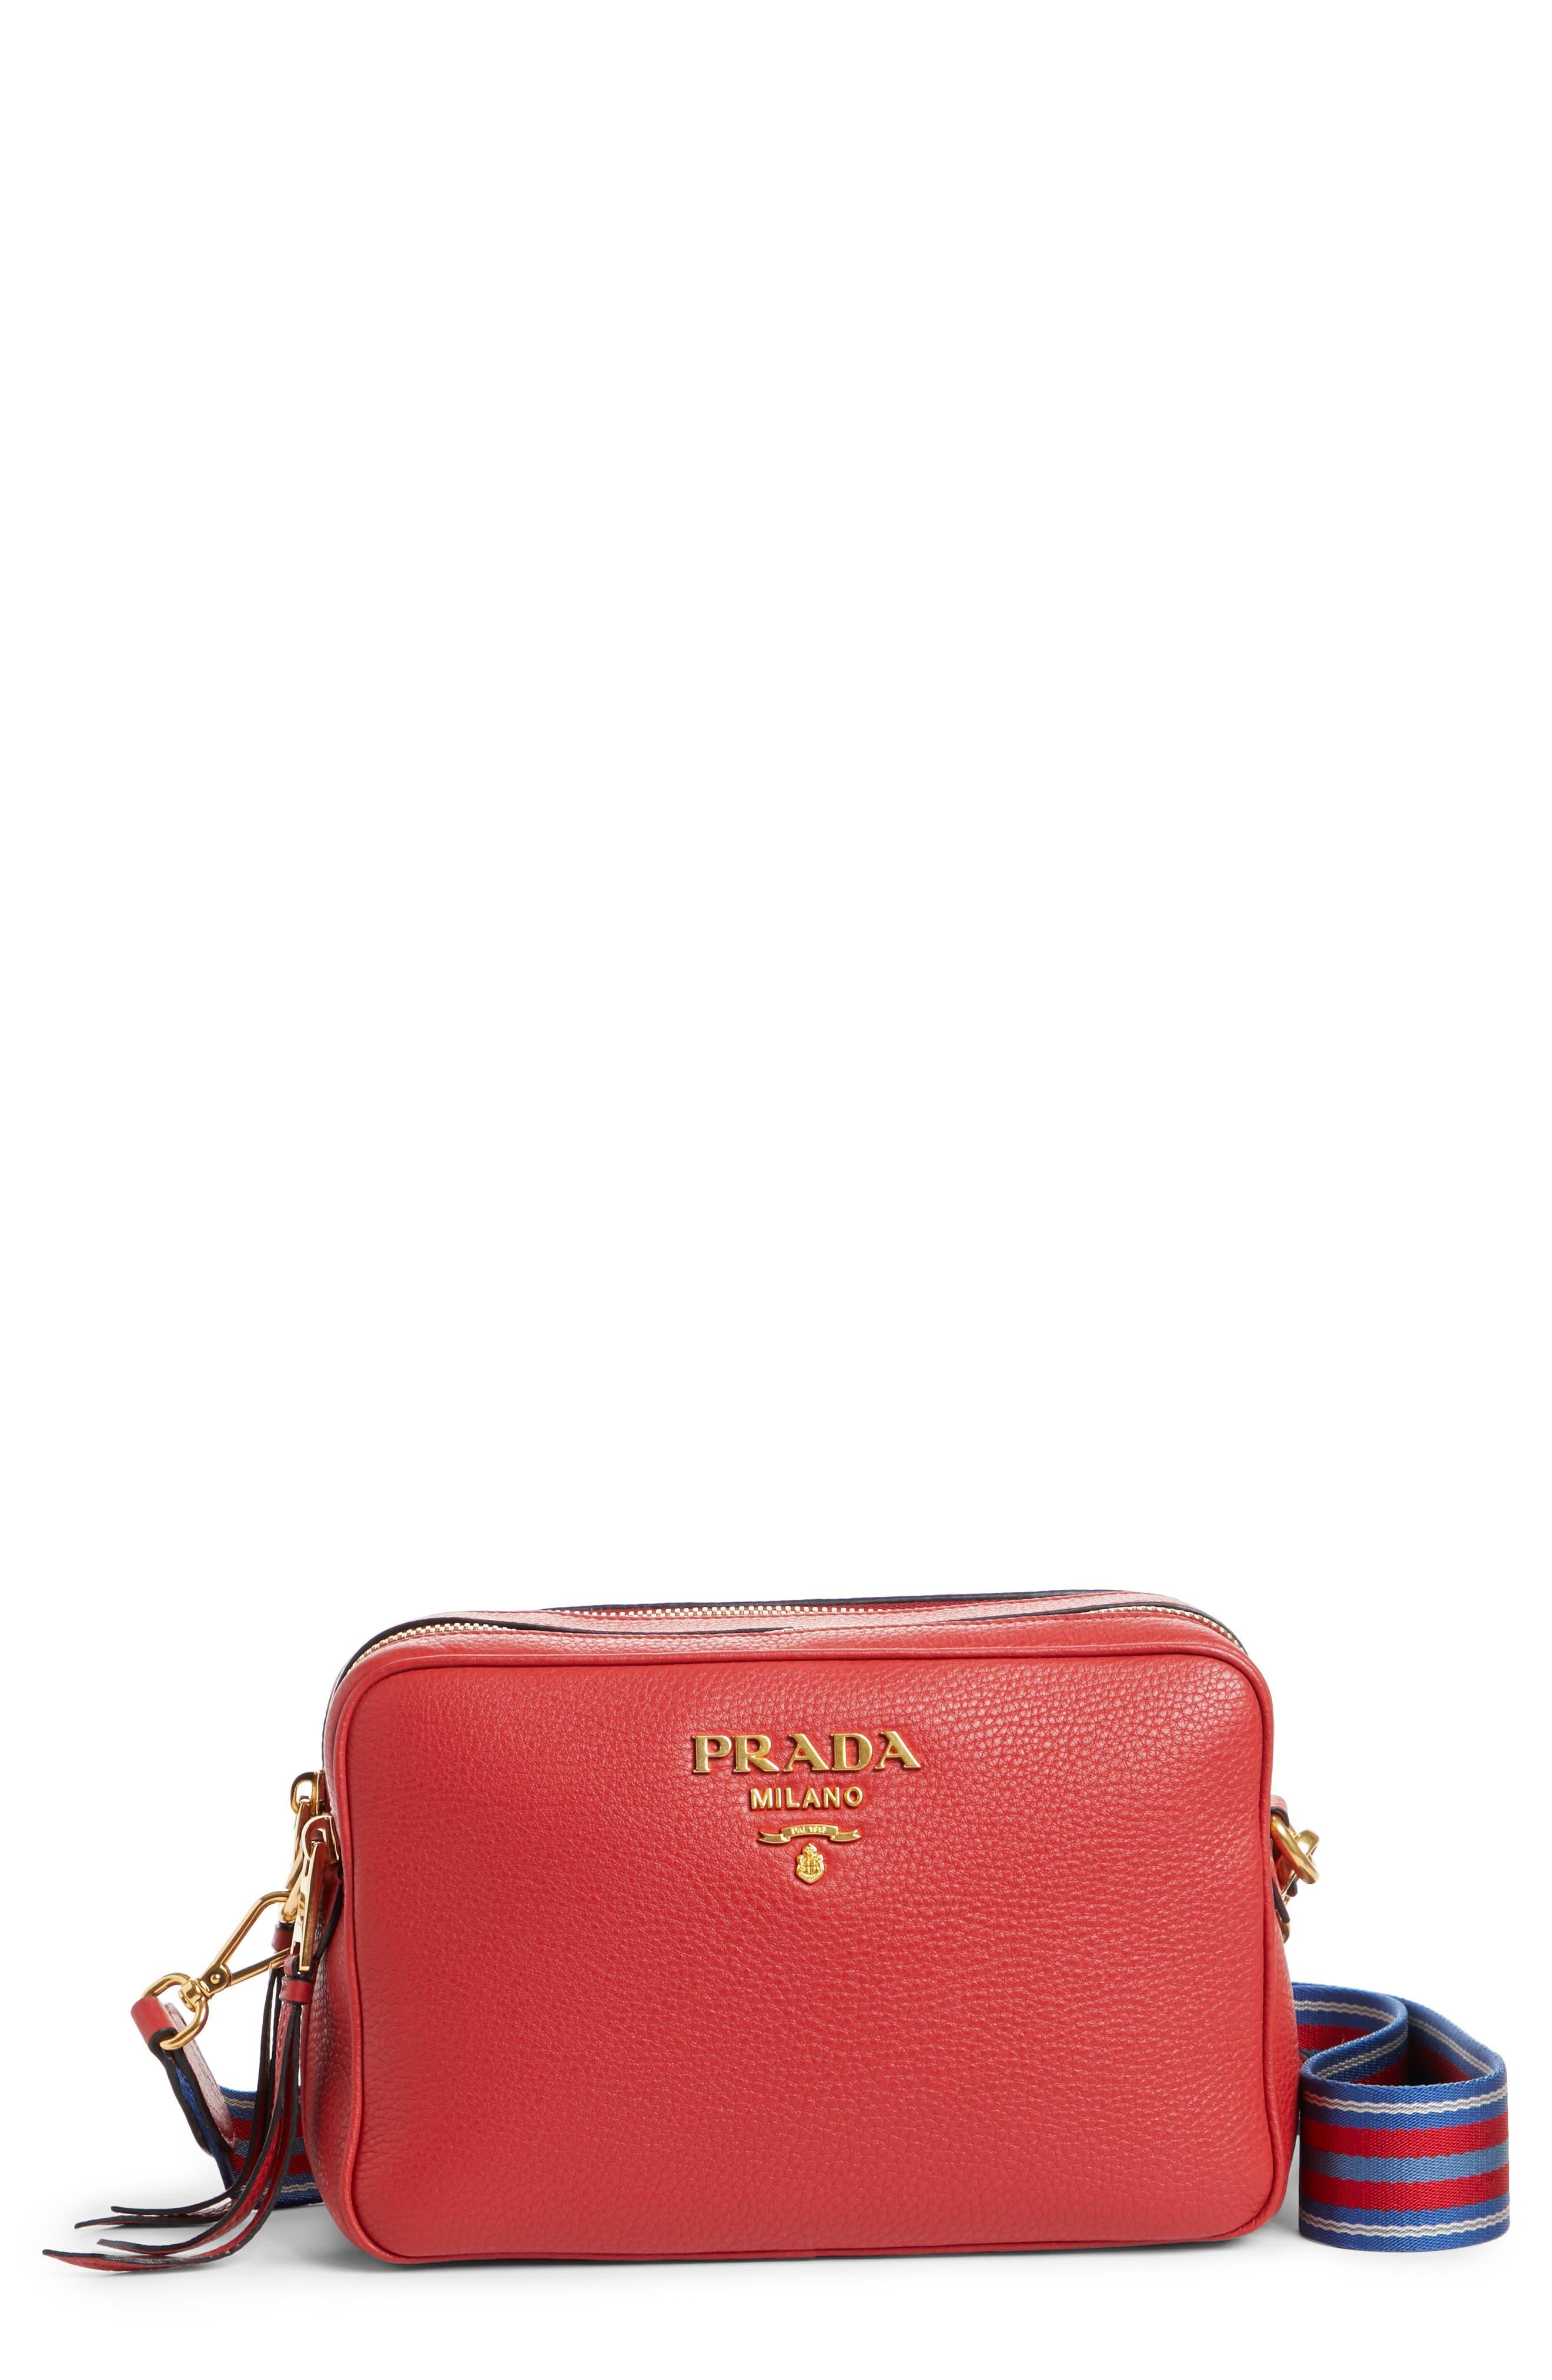 Prada Vitello Daino Leather Camera Bag